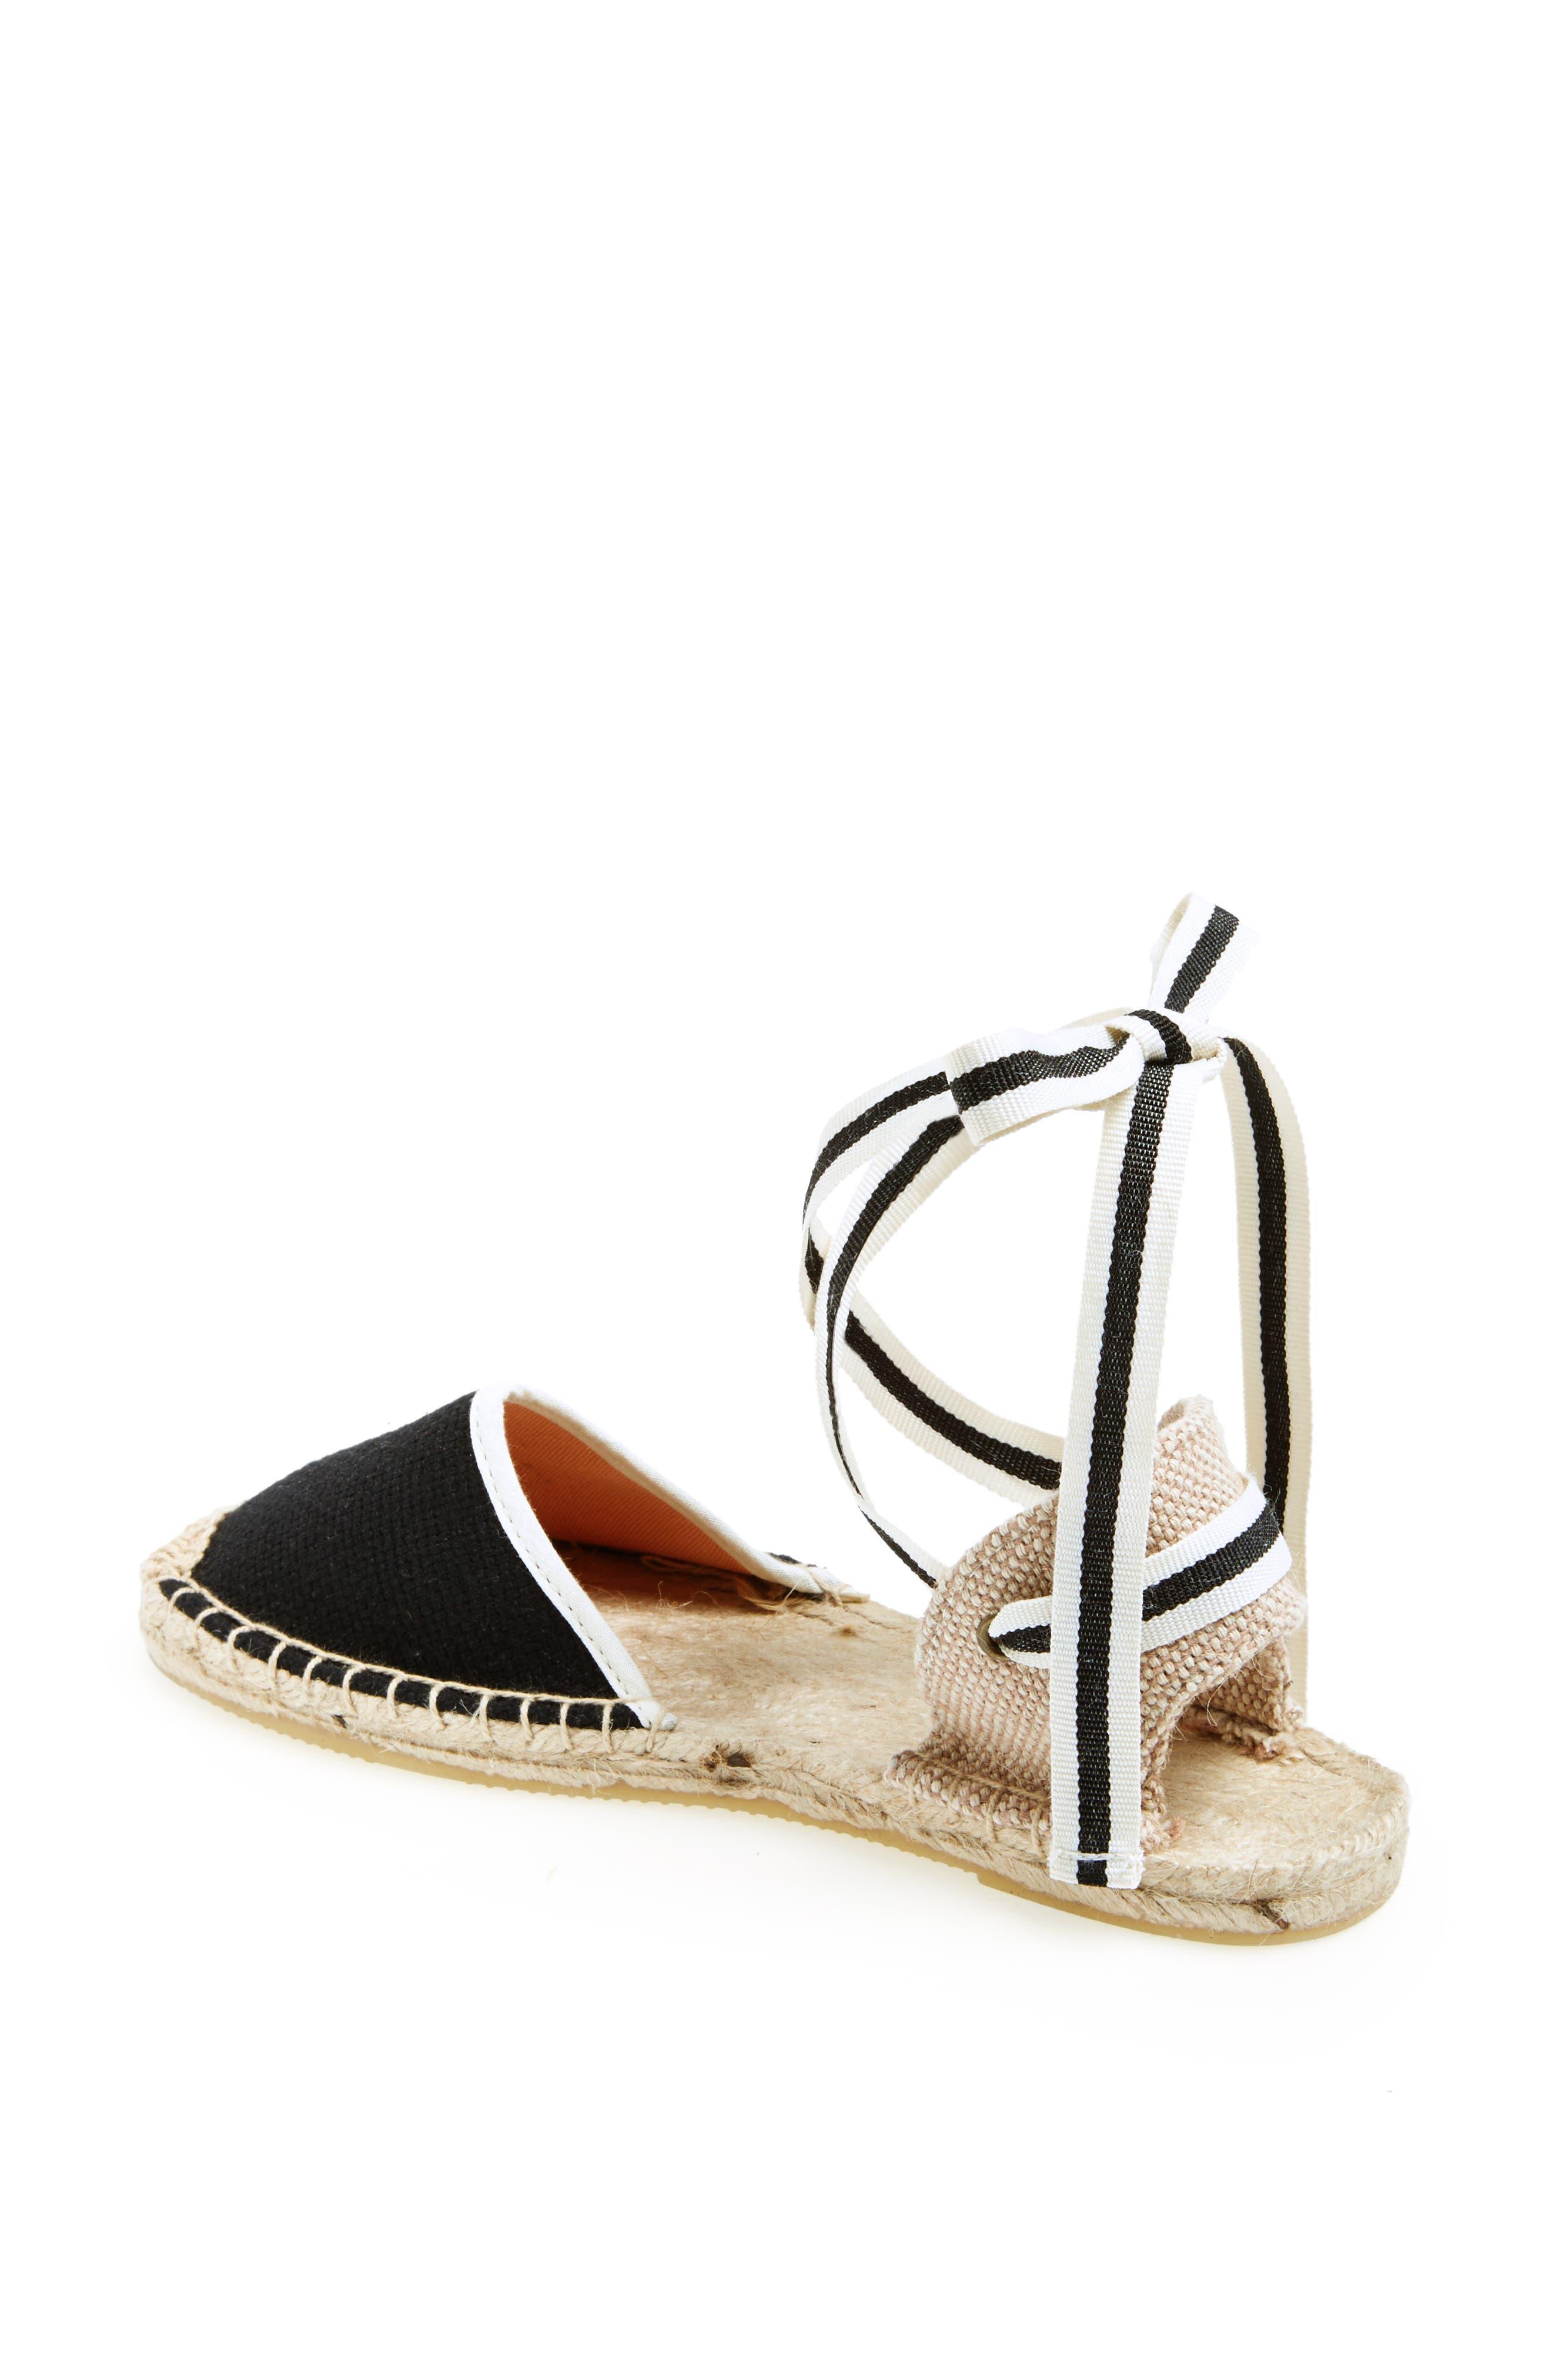 6f0fcc14f8f Soludos Lace-Up Espadrille Sandal- Black